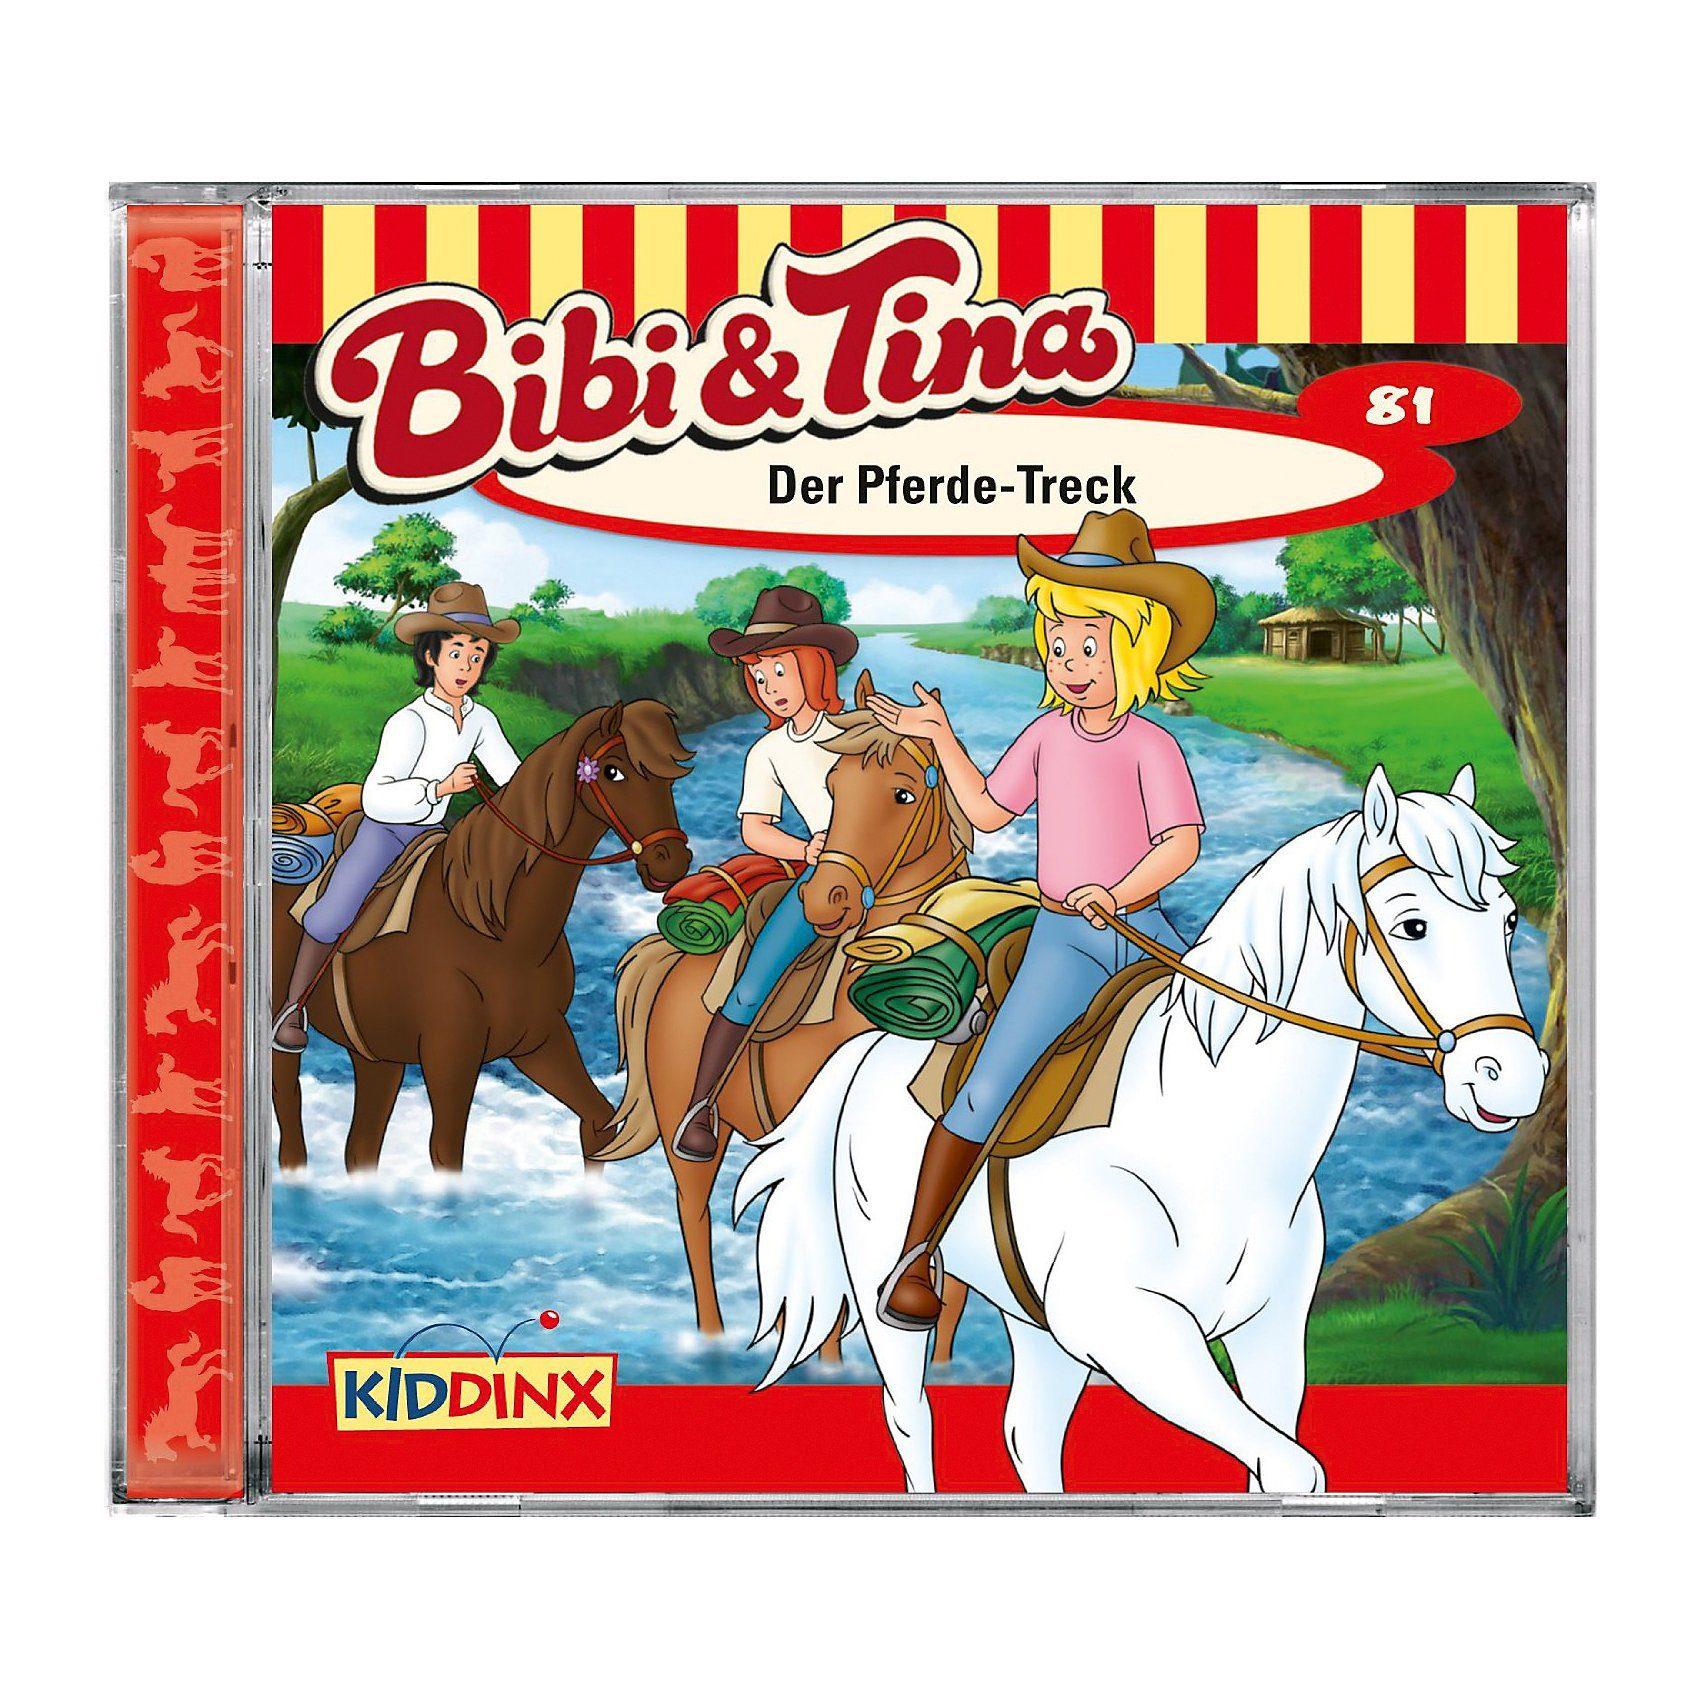 Kiddinx CD Bibi & Tina 81 - Der Pferde-Treck